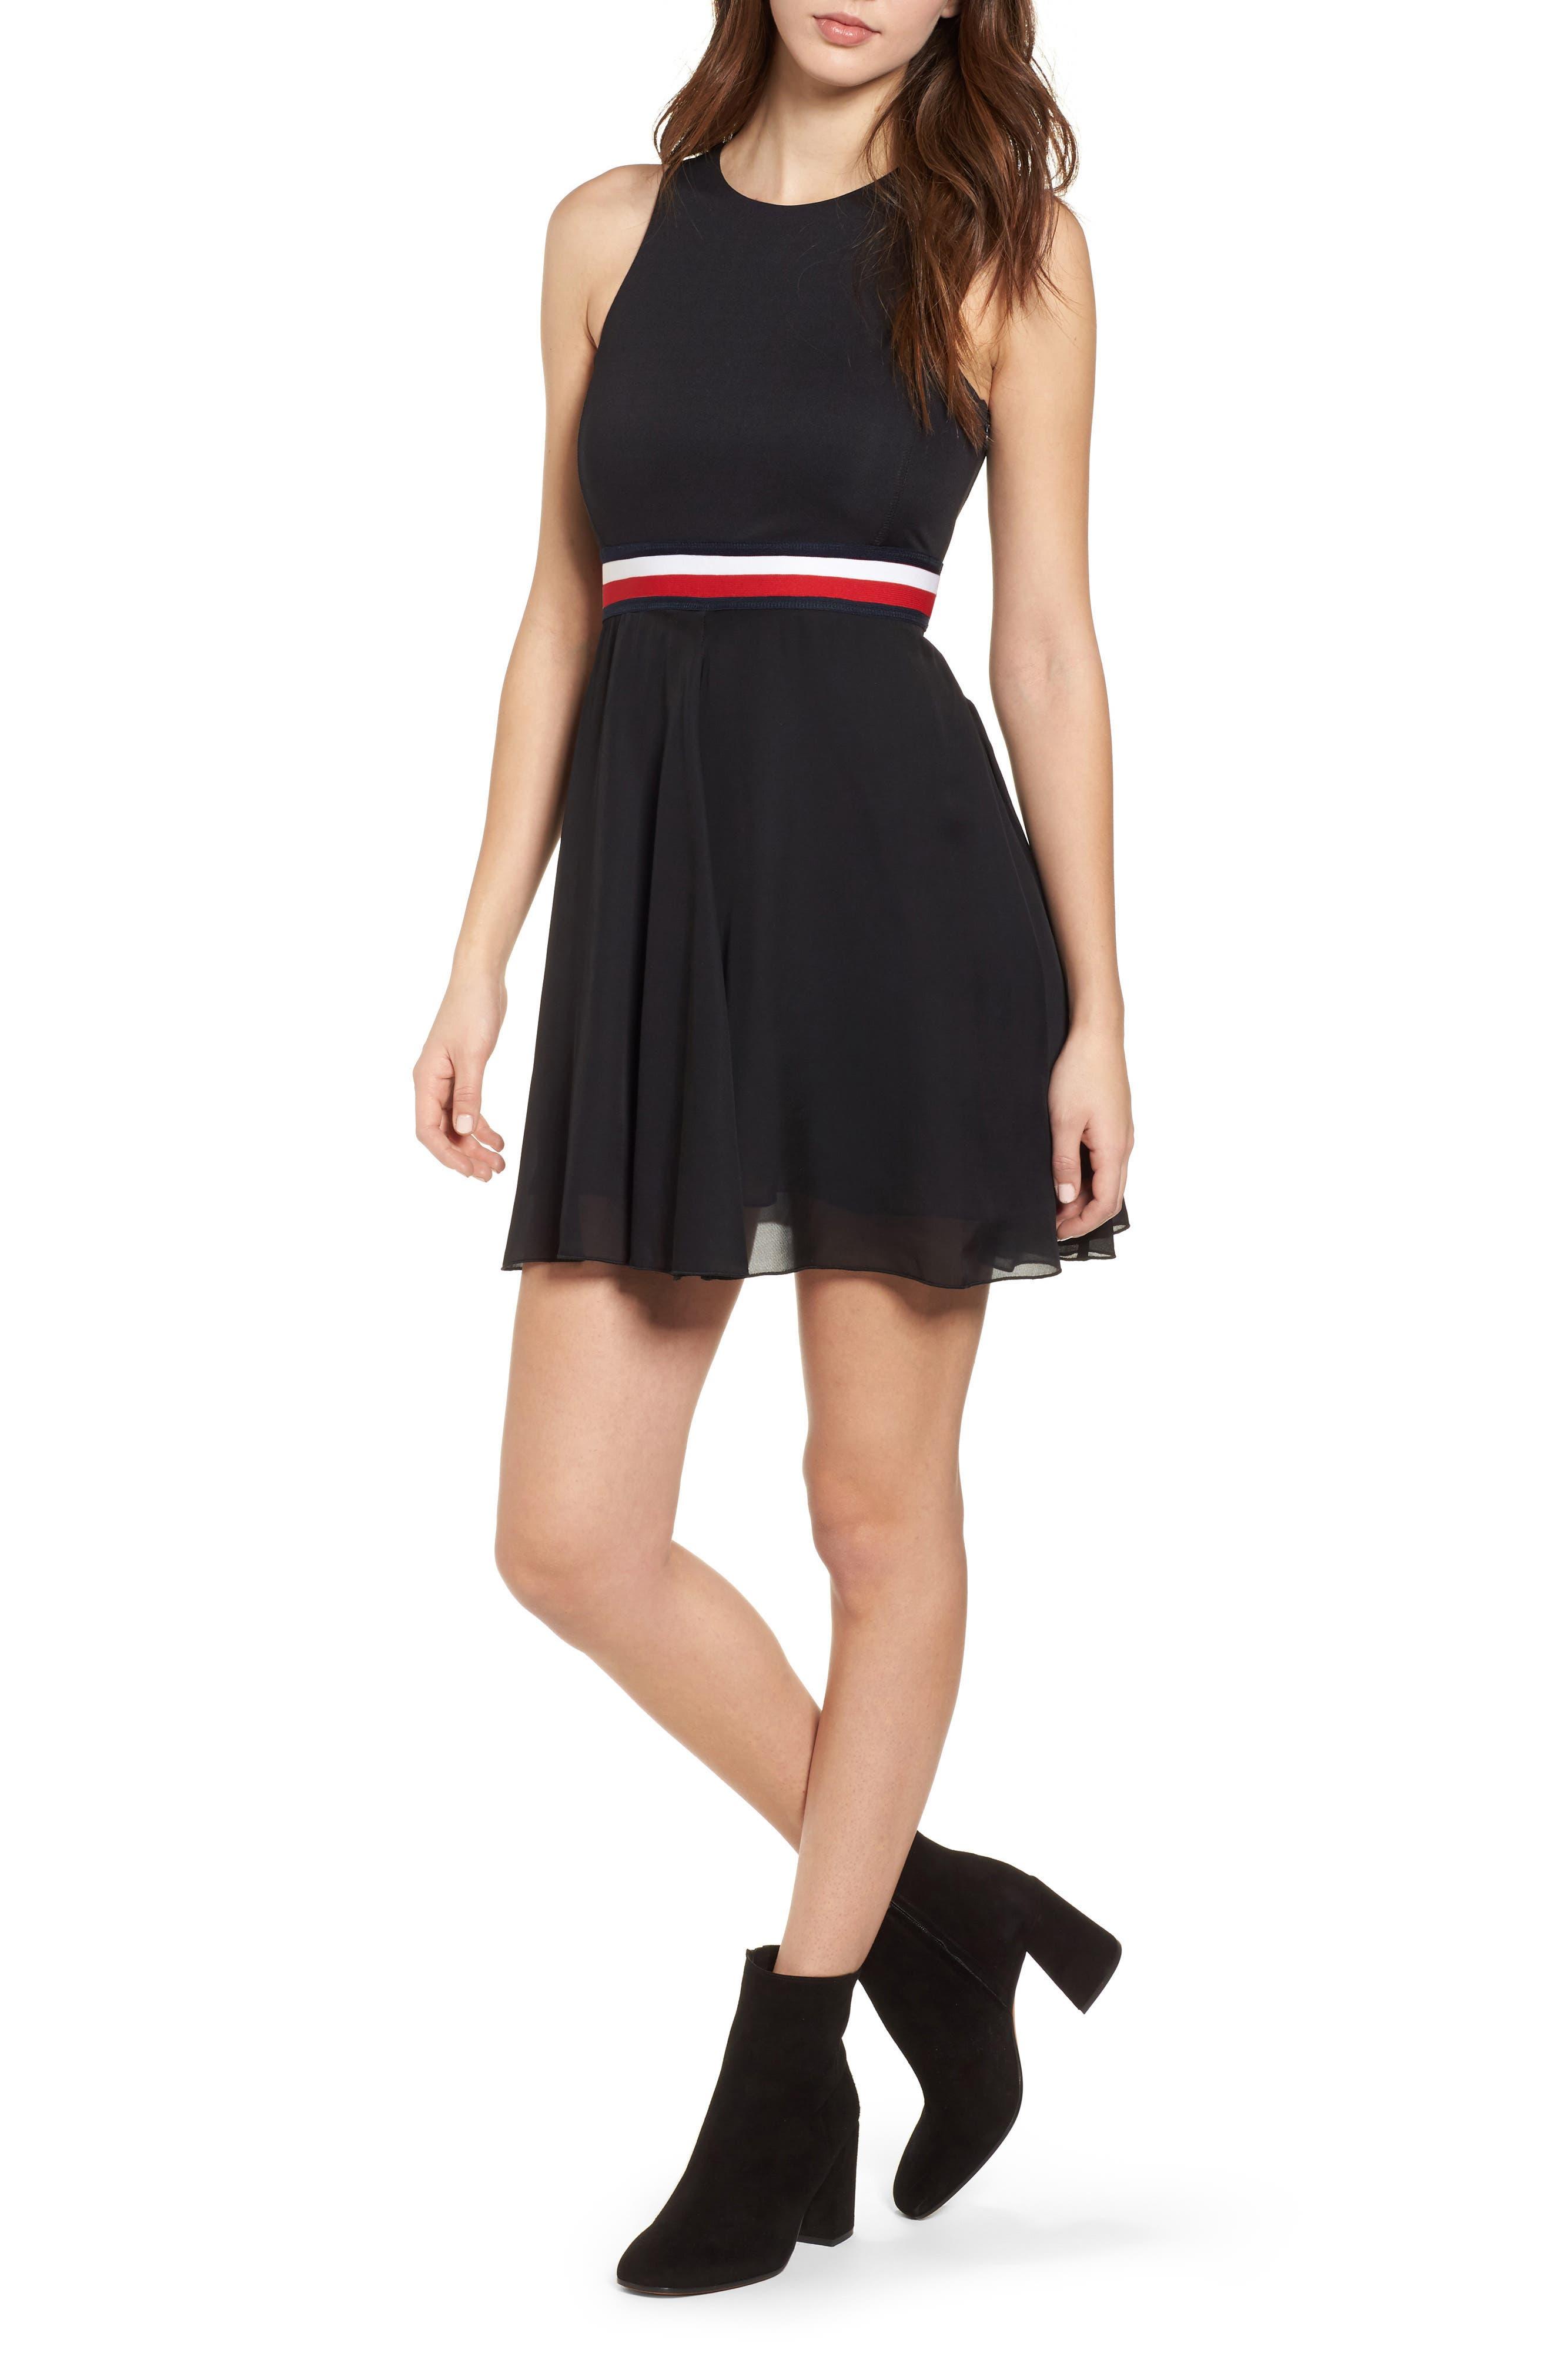 Alternate Image 1 Selected - TOMMY JEANS x Gigi Hadid Racerback Dress